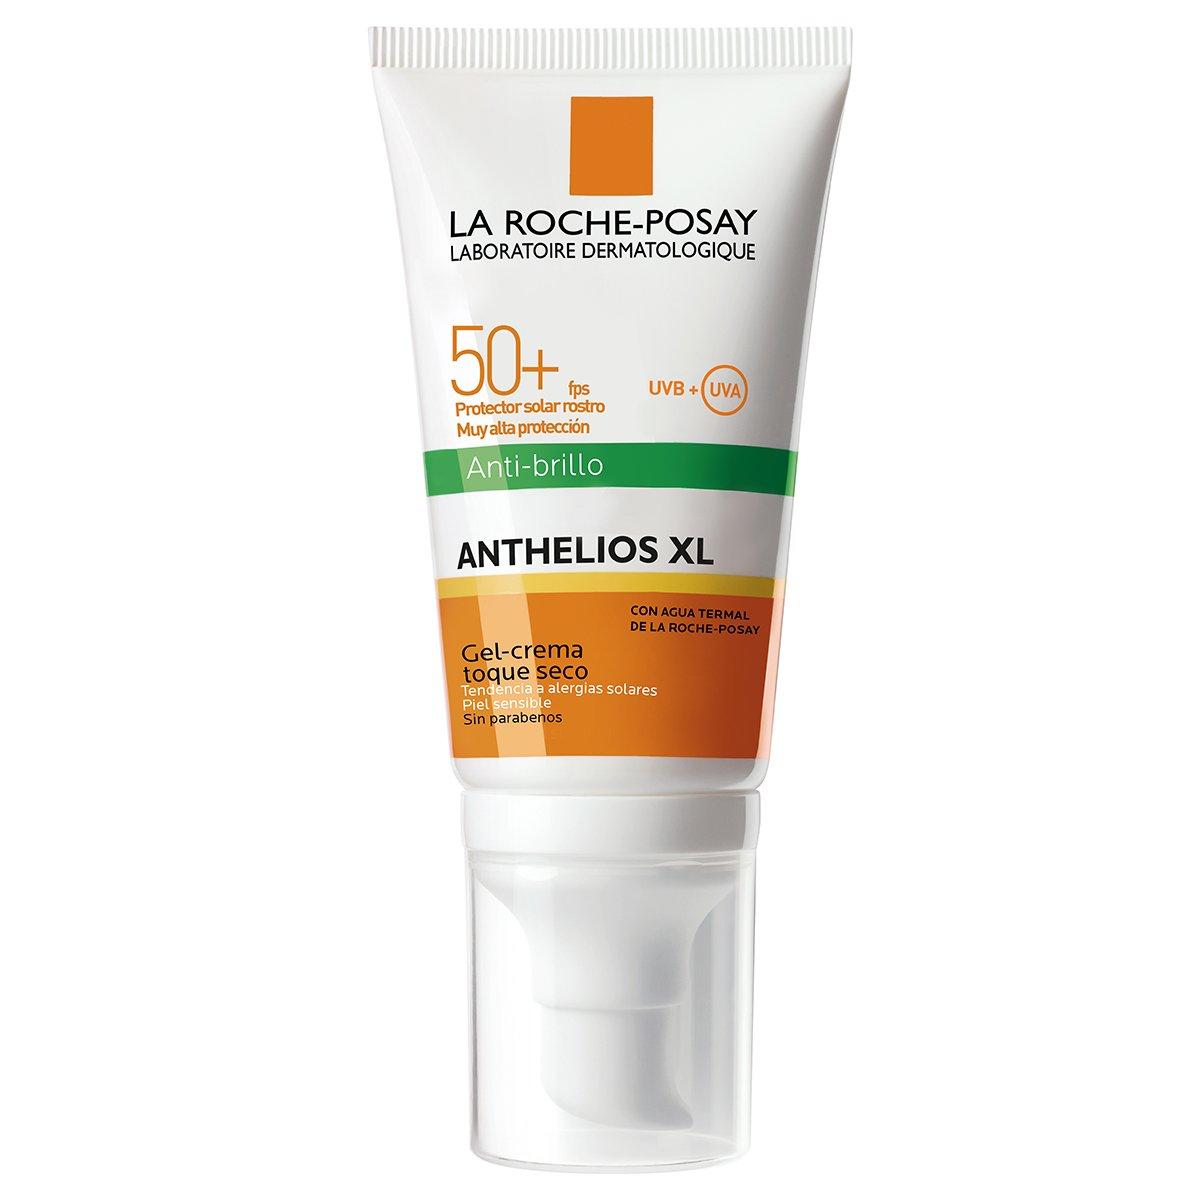 Anthelios XL Gel Crema Toque Seco con Perfume SPF50 50ML LA ROCHE POSAY 3337875546409